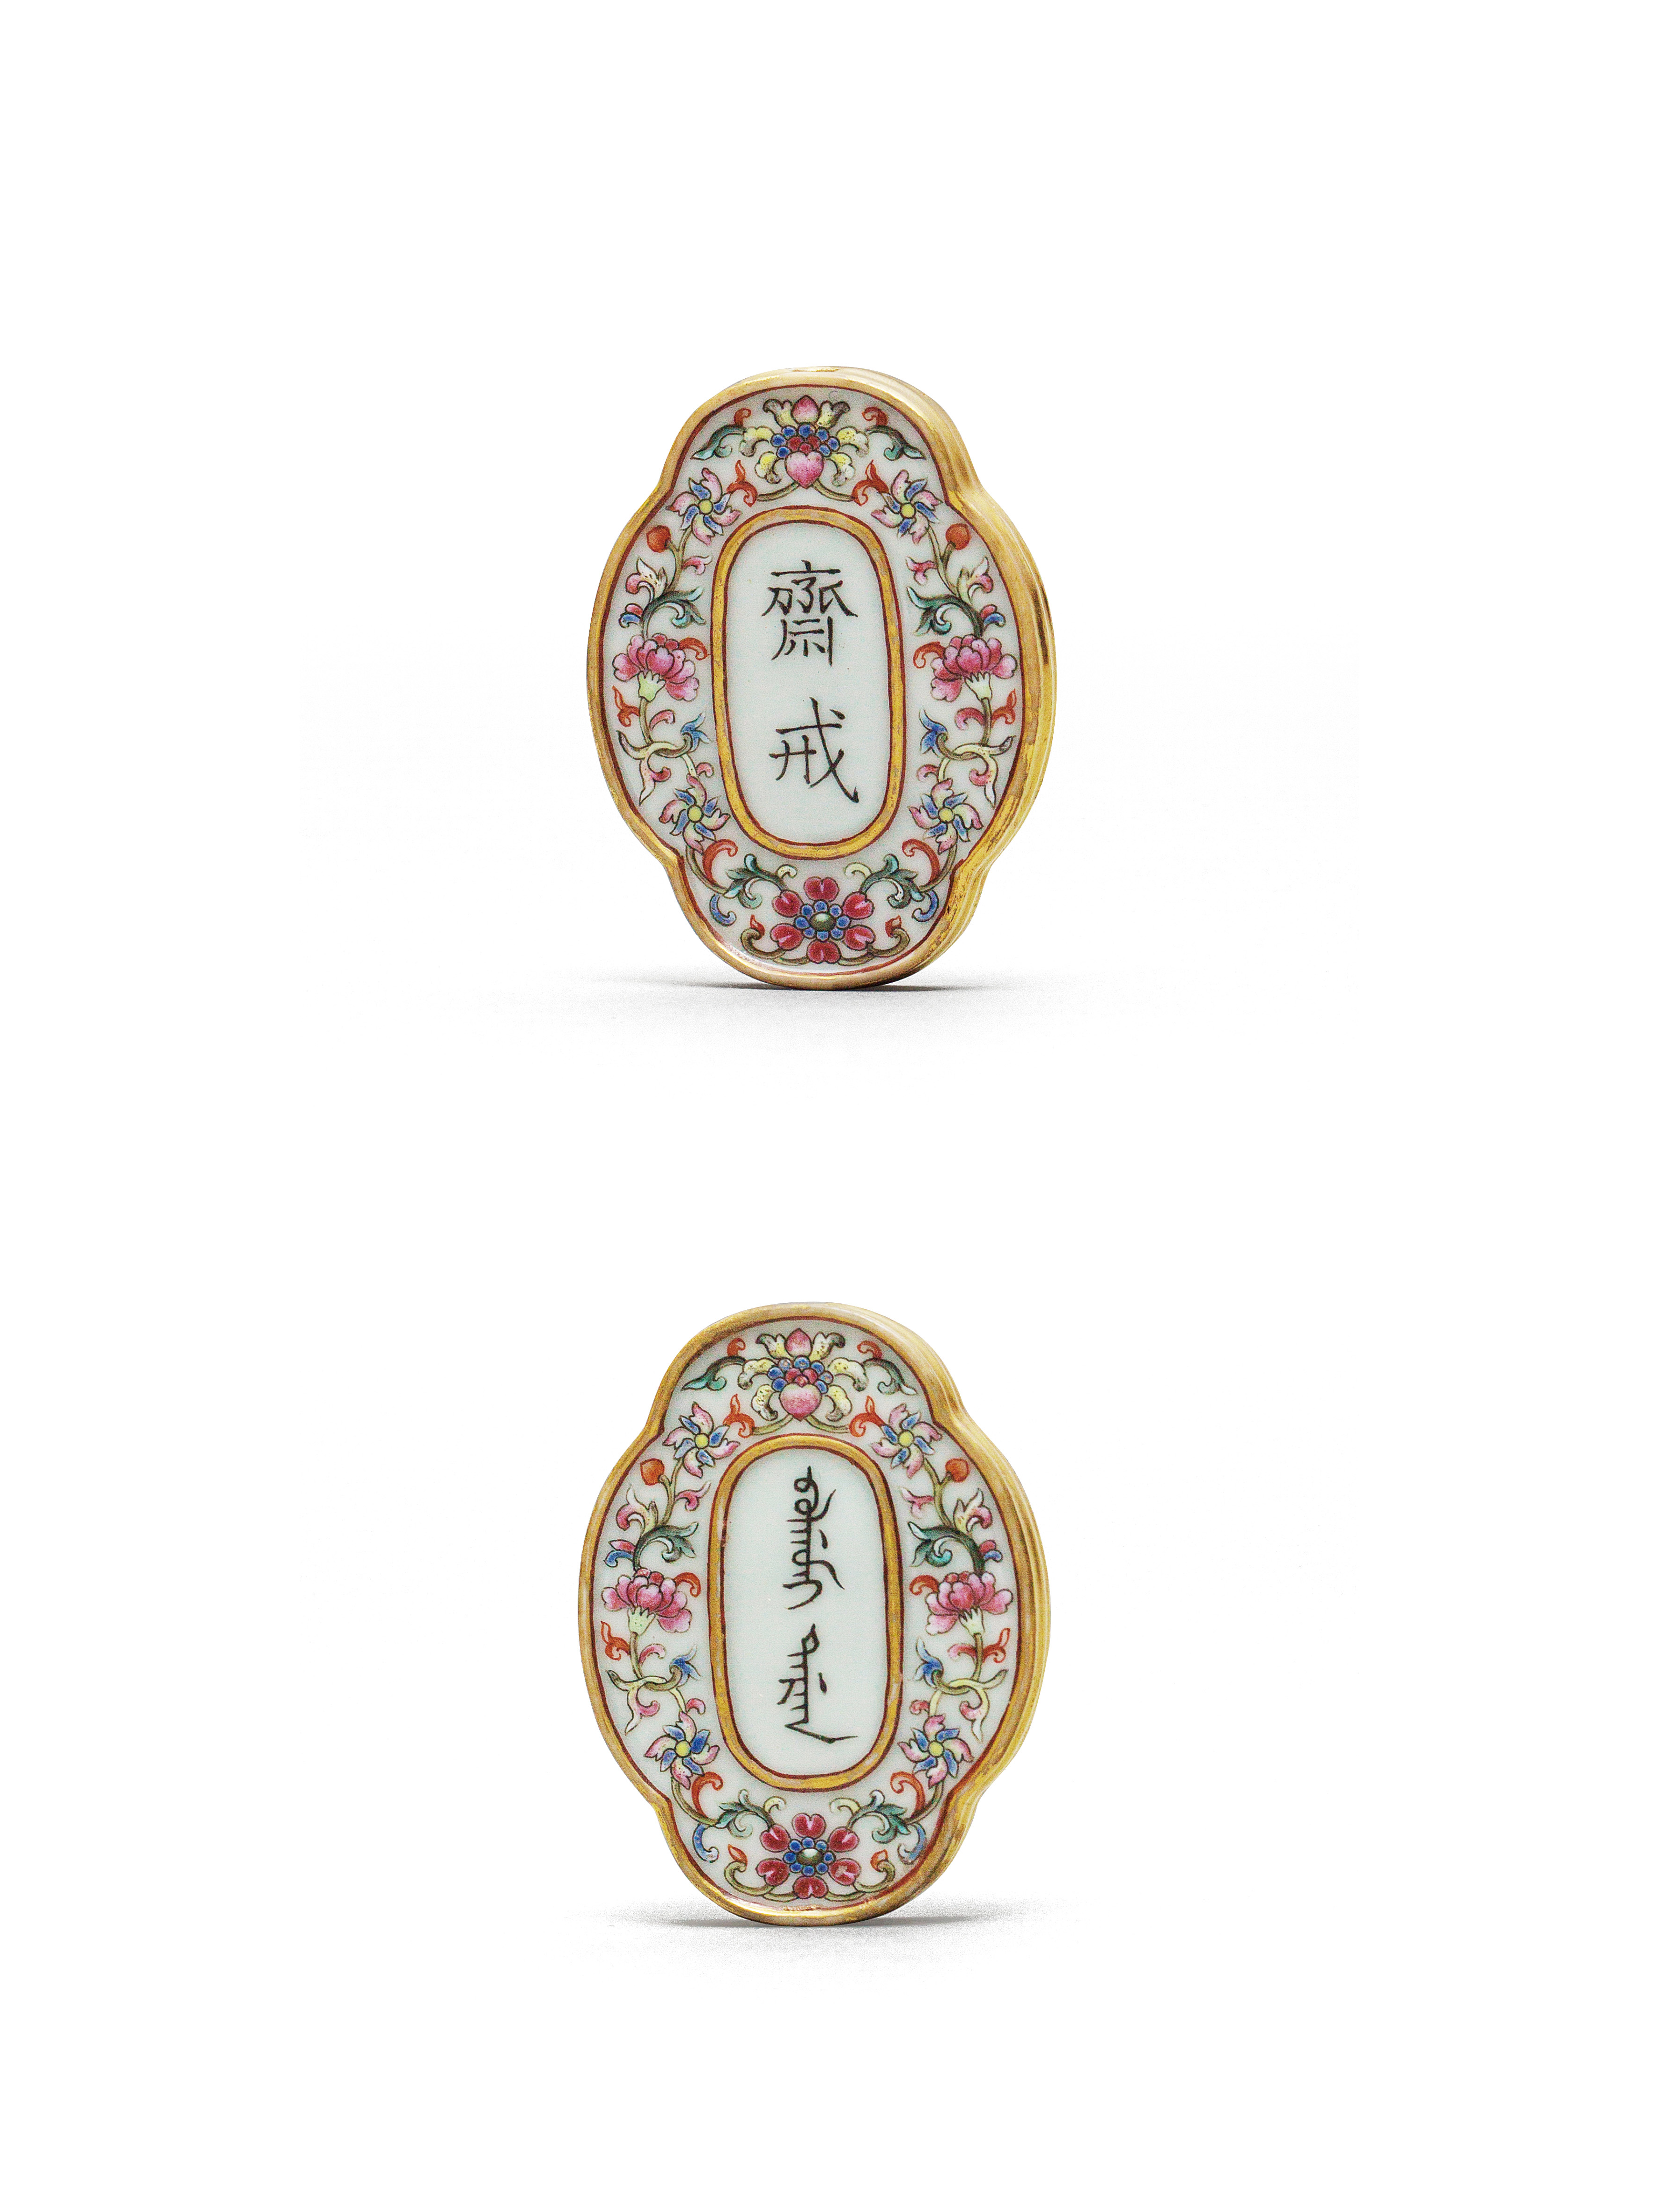 Lot 29 - A famille rose 'Zhai Jie' abstinence plaque, Qing dynasty, Qianlong period